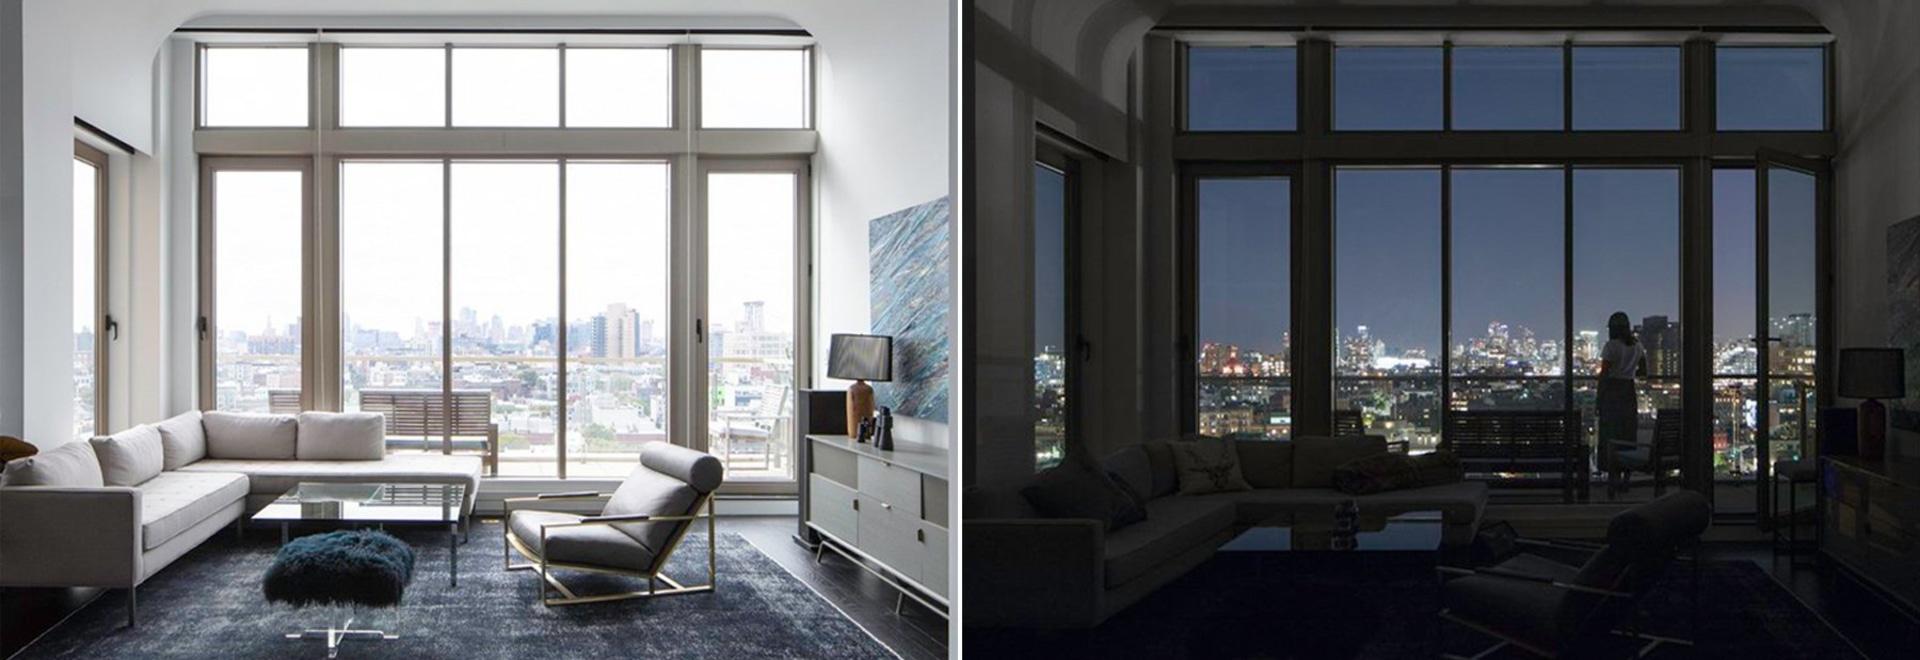 INABA courbe doucement le plafond de l'appartement'williamsburg penthouse' à brooklyn